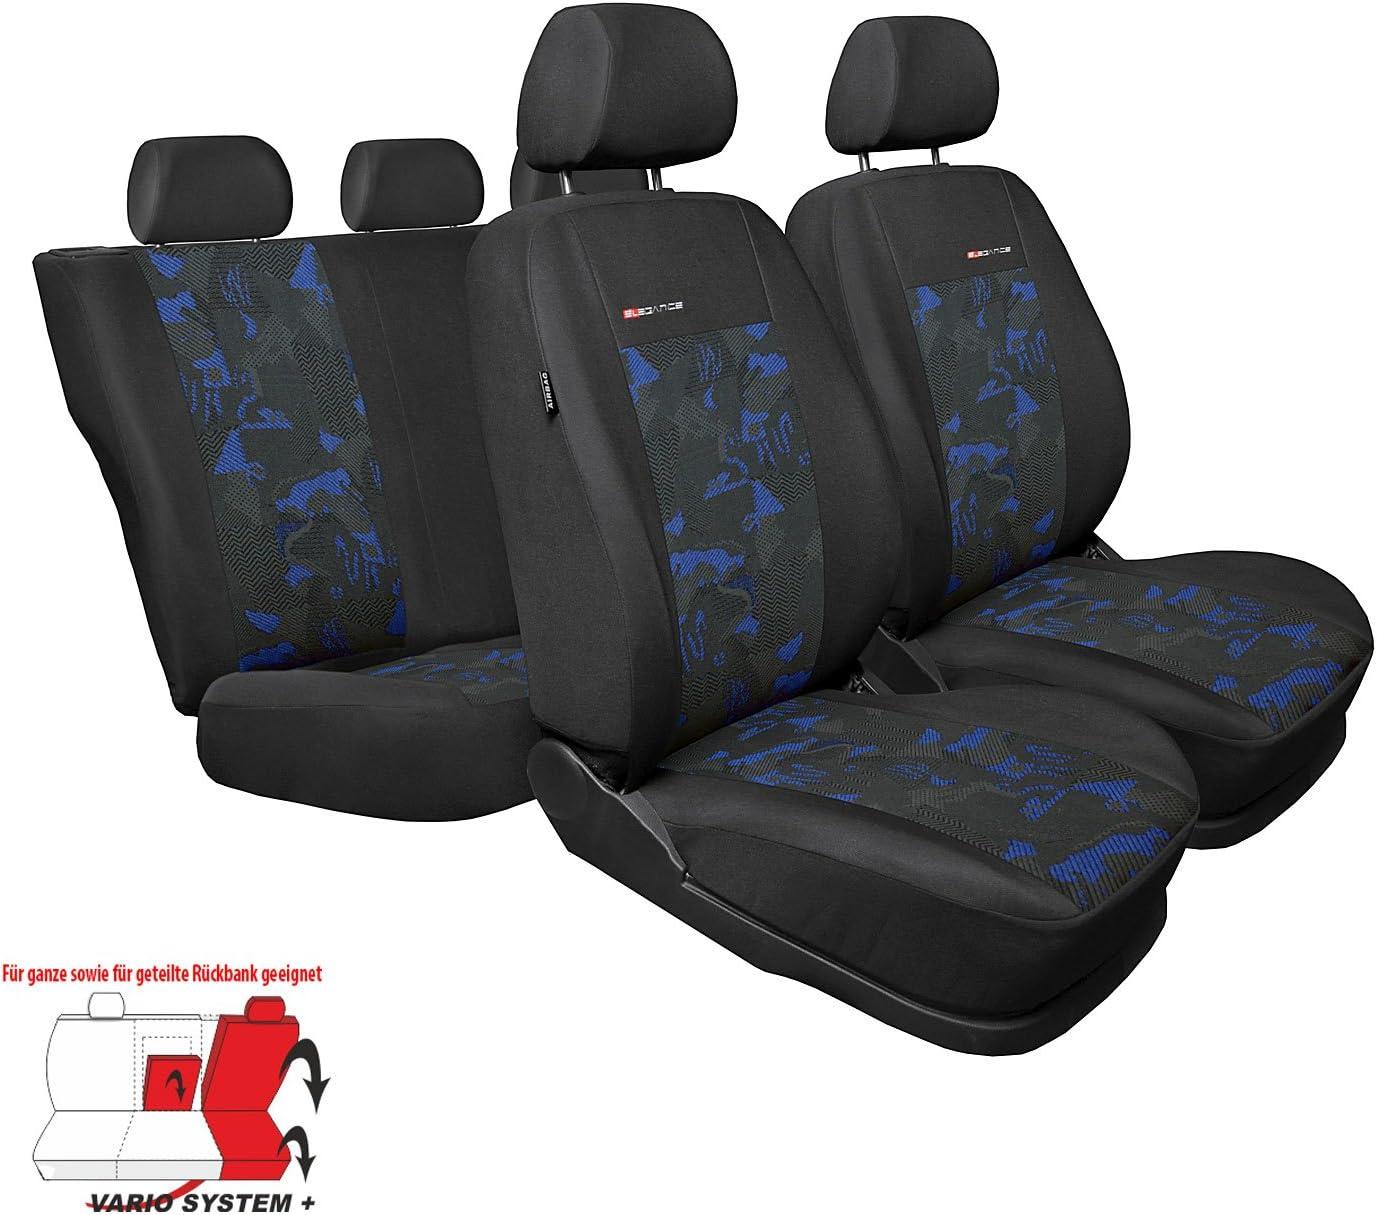 Universal Rot Sitzbez/üge Komplettset Sitzbezug f/ür Auto Sitzschoner Set Schonbez/üge Autositz Autositzbez/üge Sitzauflagen Sitzschutz Elegance Saferide